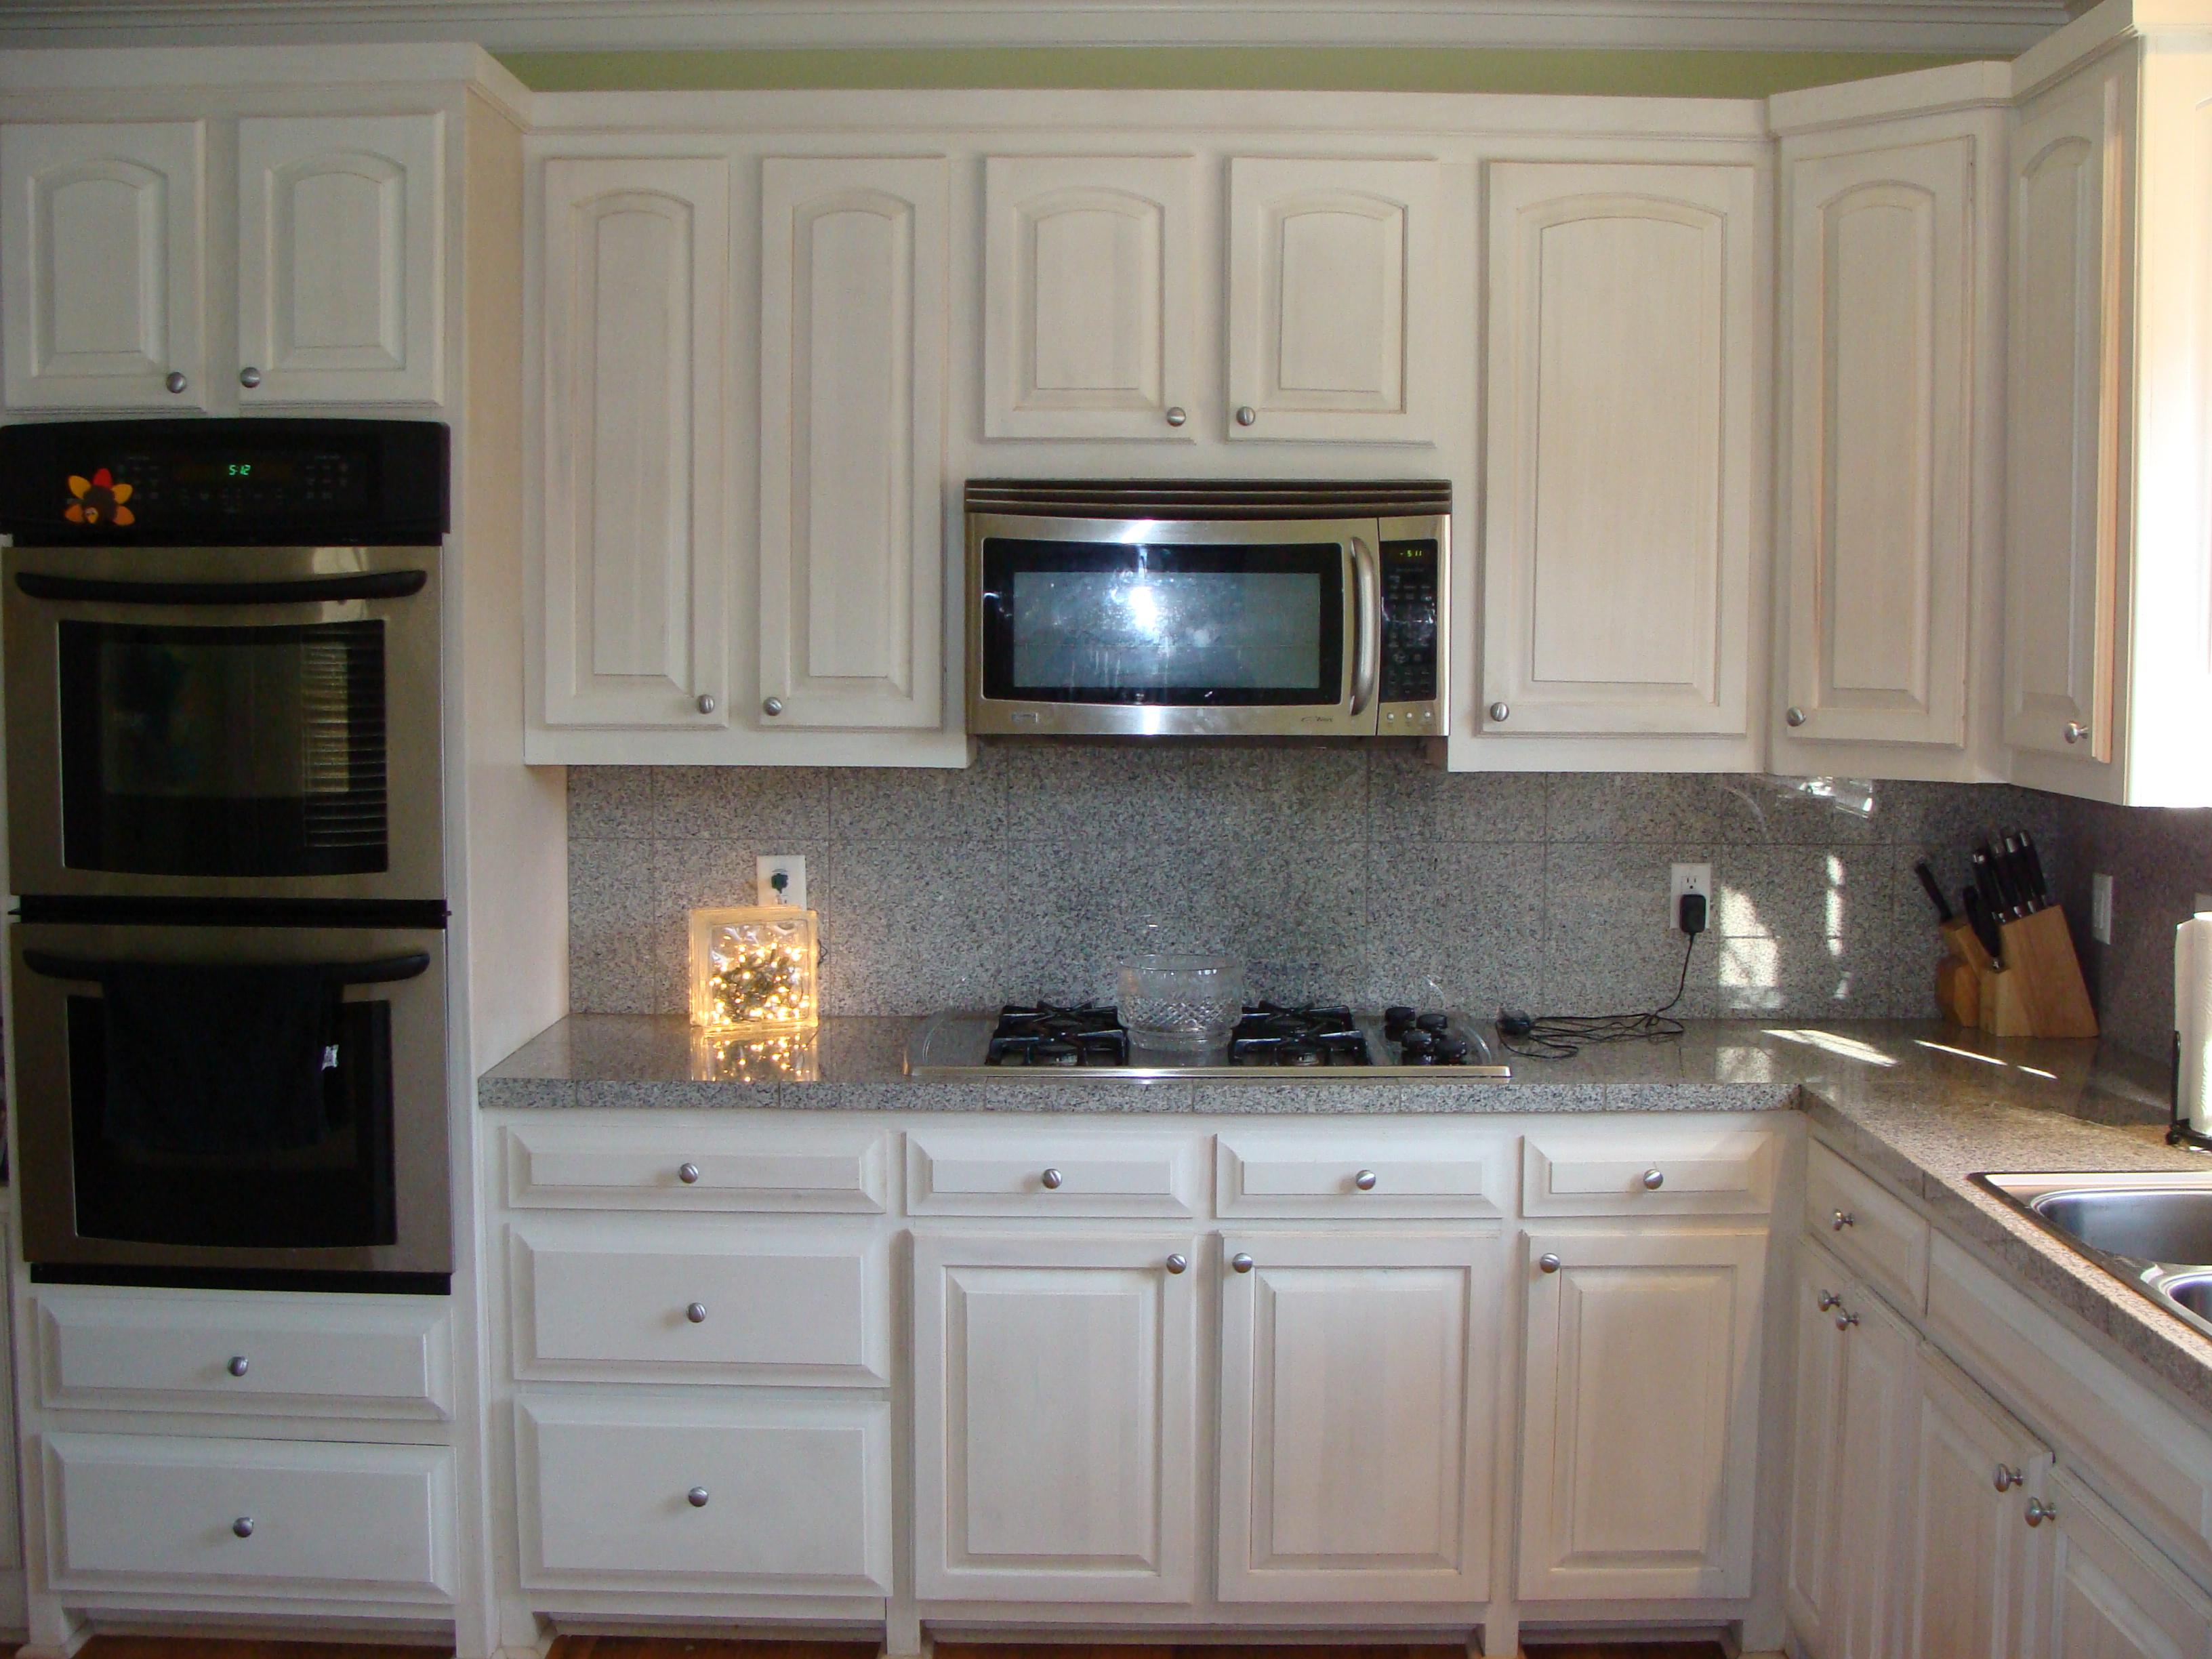 Kitchen island with cabinets Photo - 6